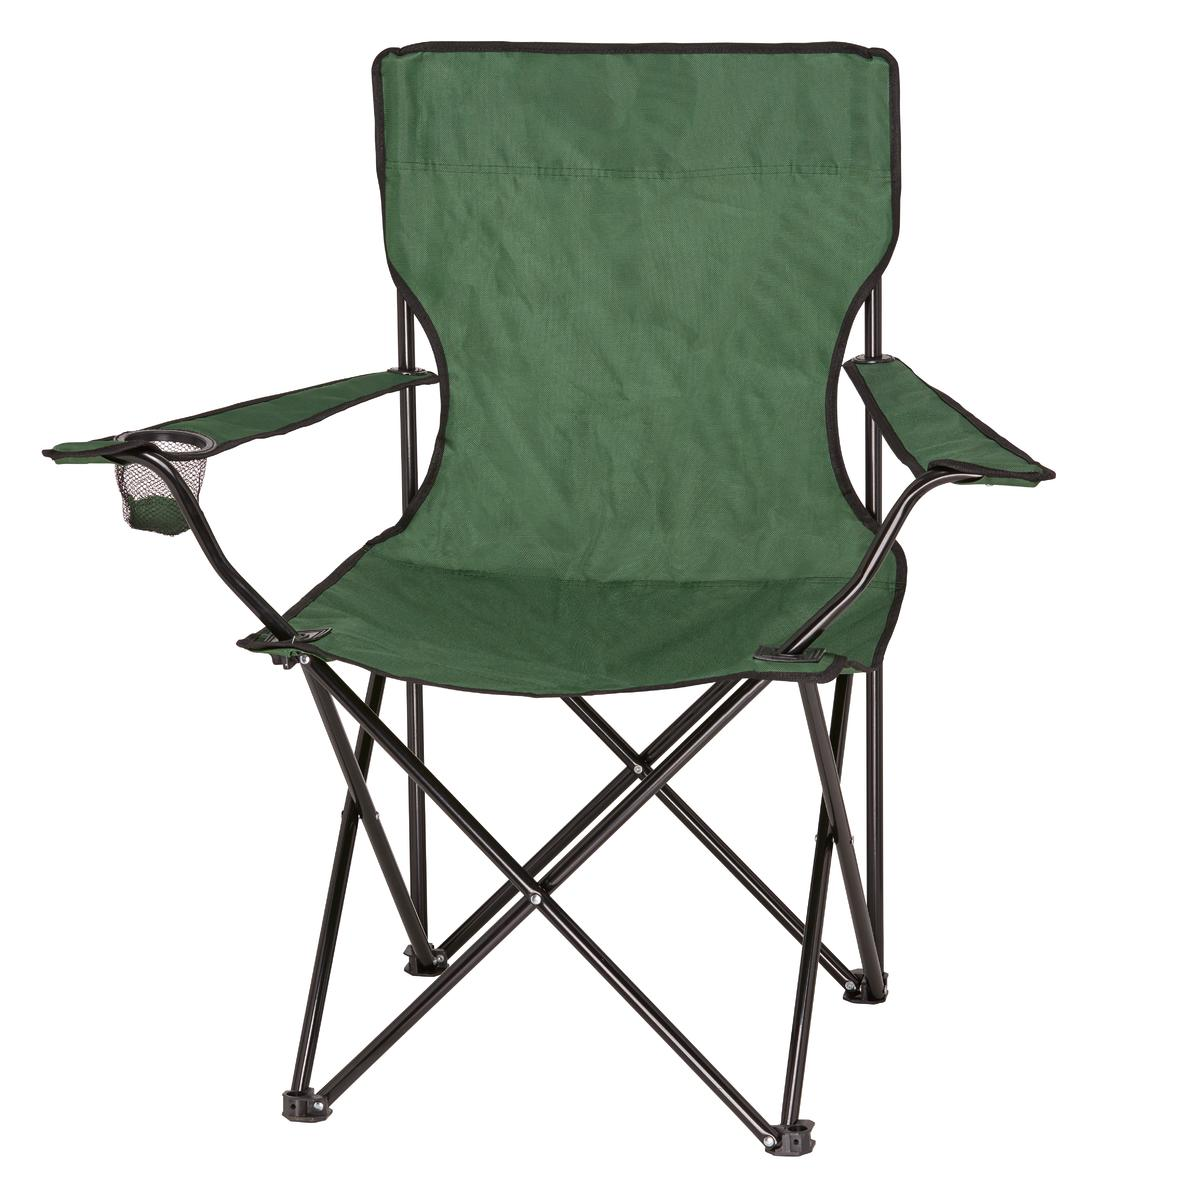 Camping Chair Safari Green